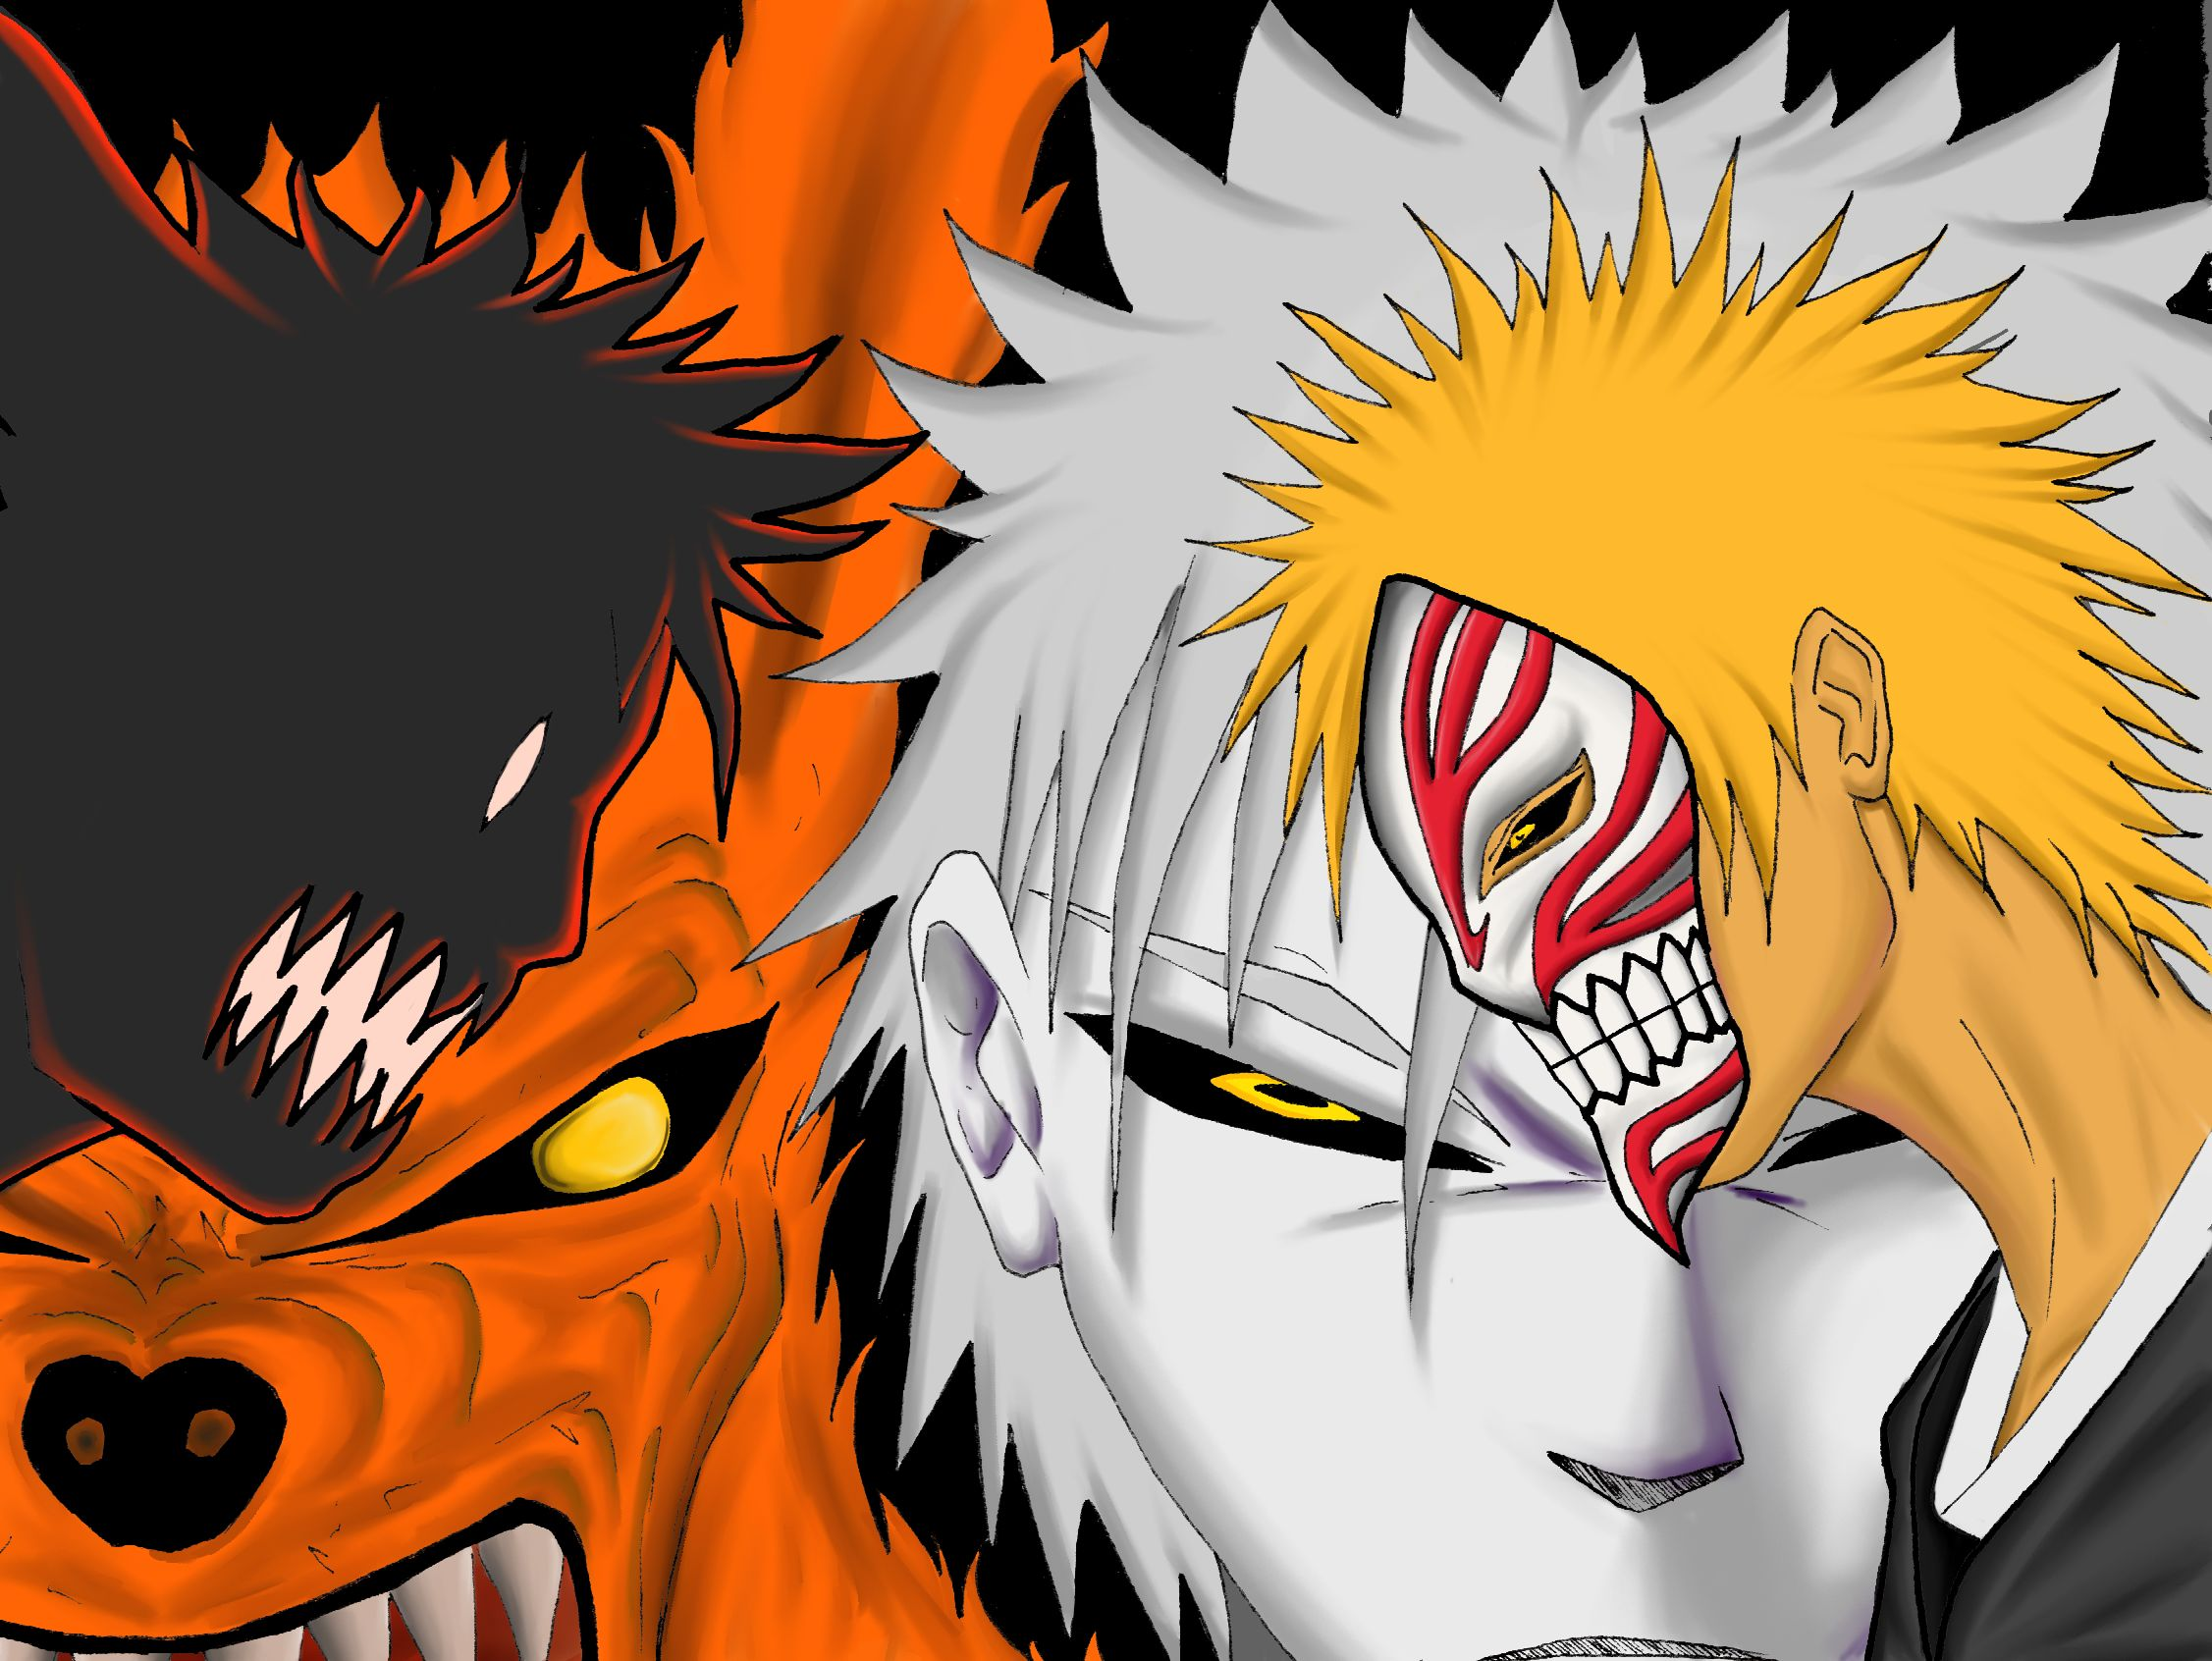 Naruto Kurosaki Gallery | 2253 x 1692 jpeg 392kB